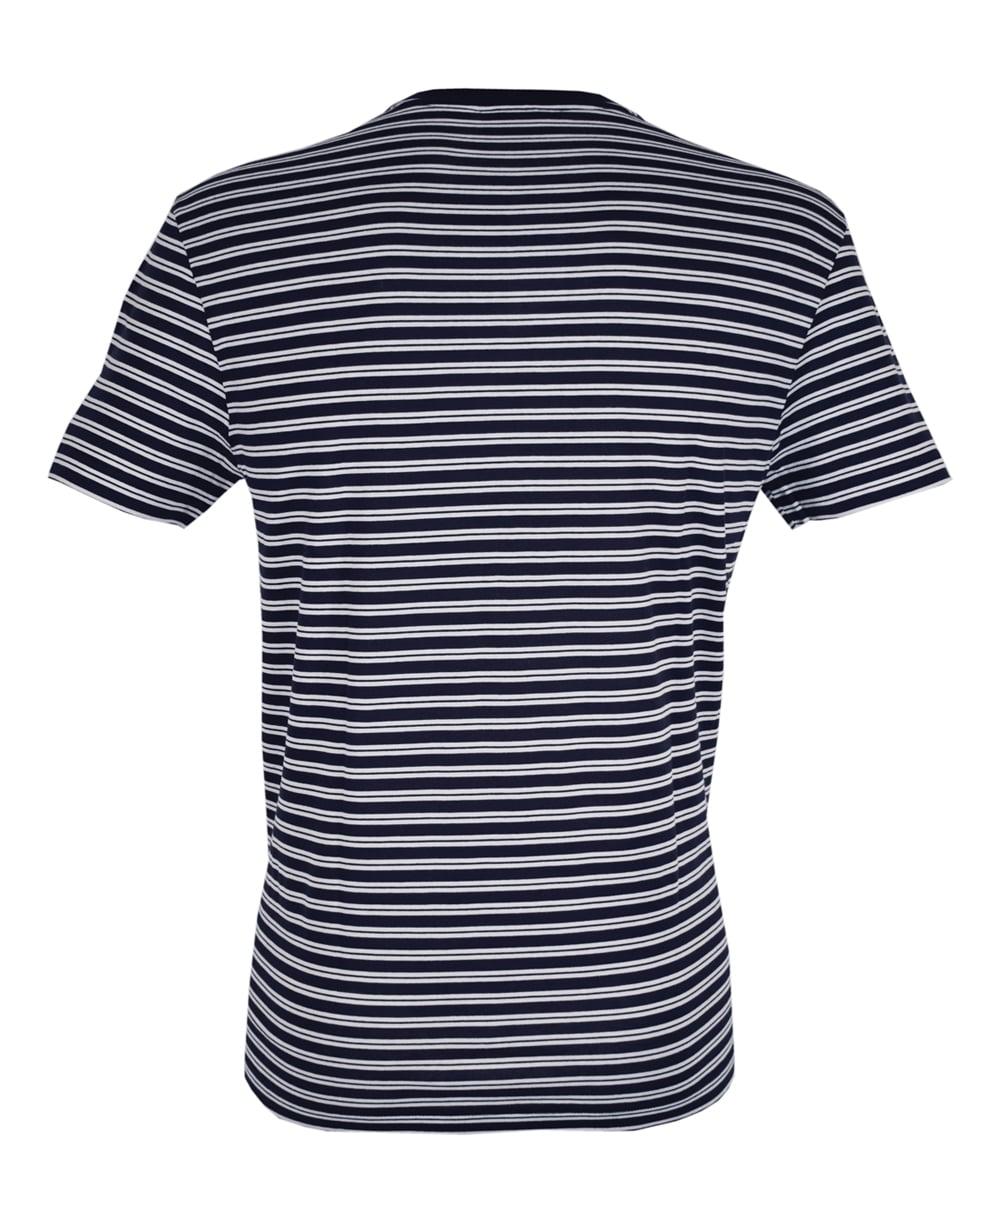 Dark blue white stripe th1889 crew neck t shirt for Blue white striped t shirt